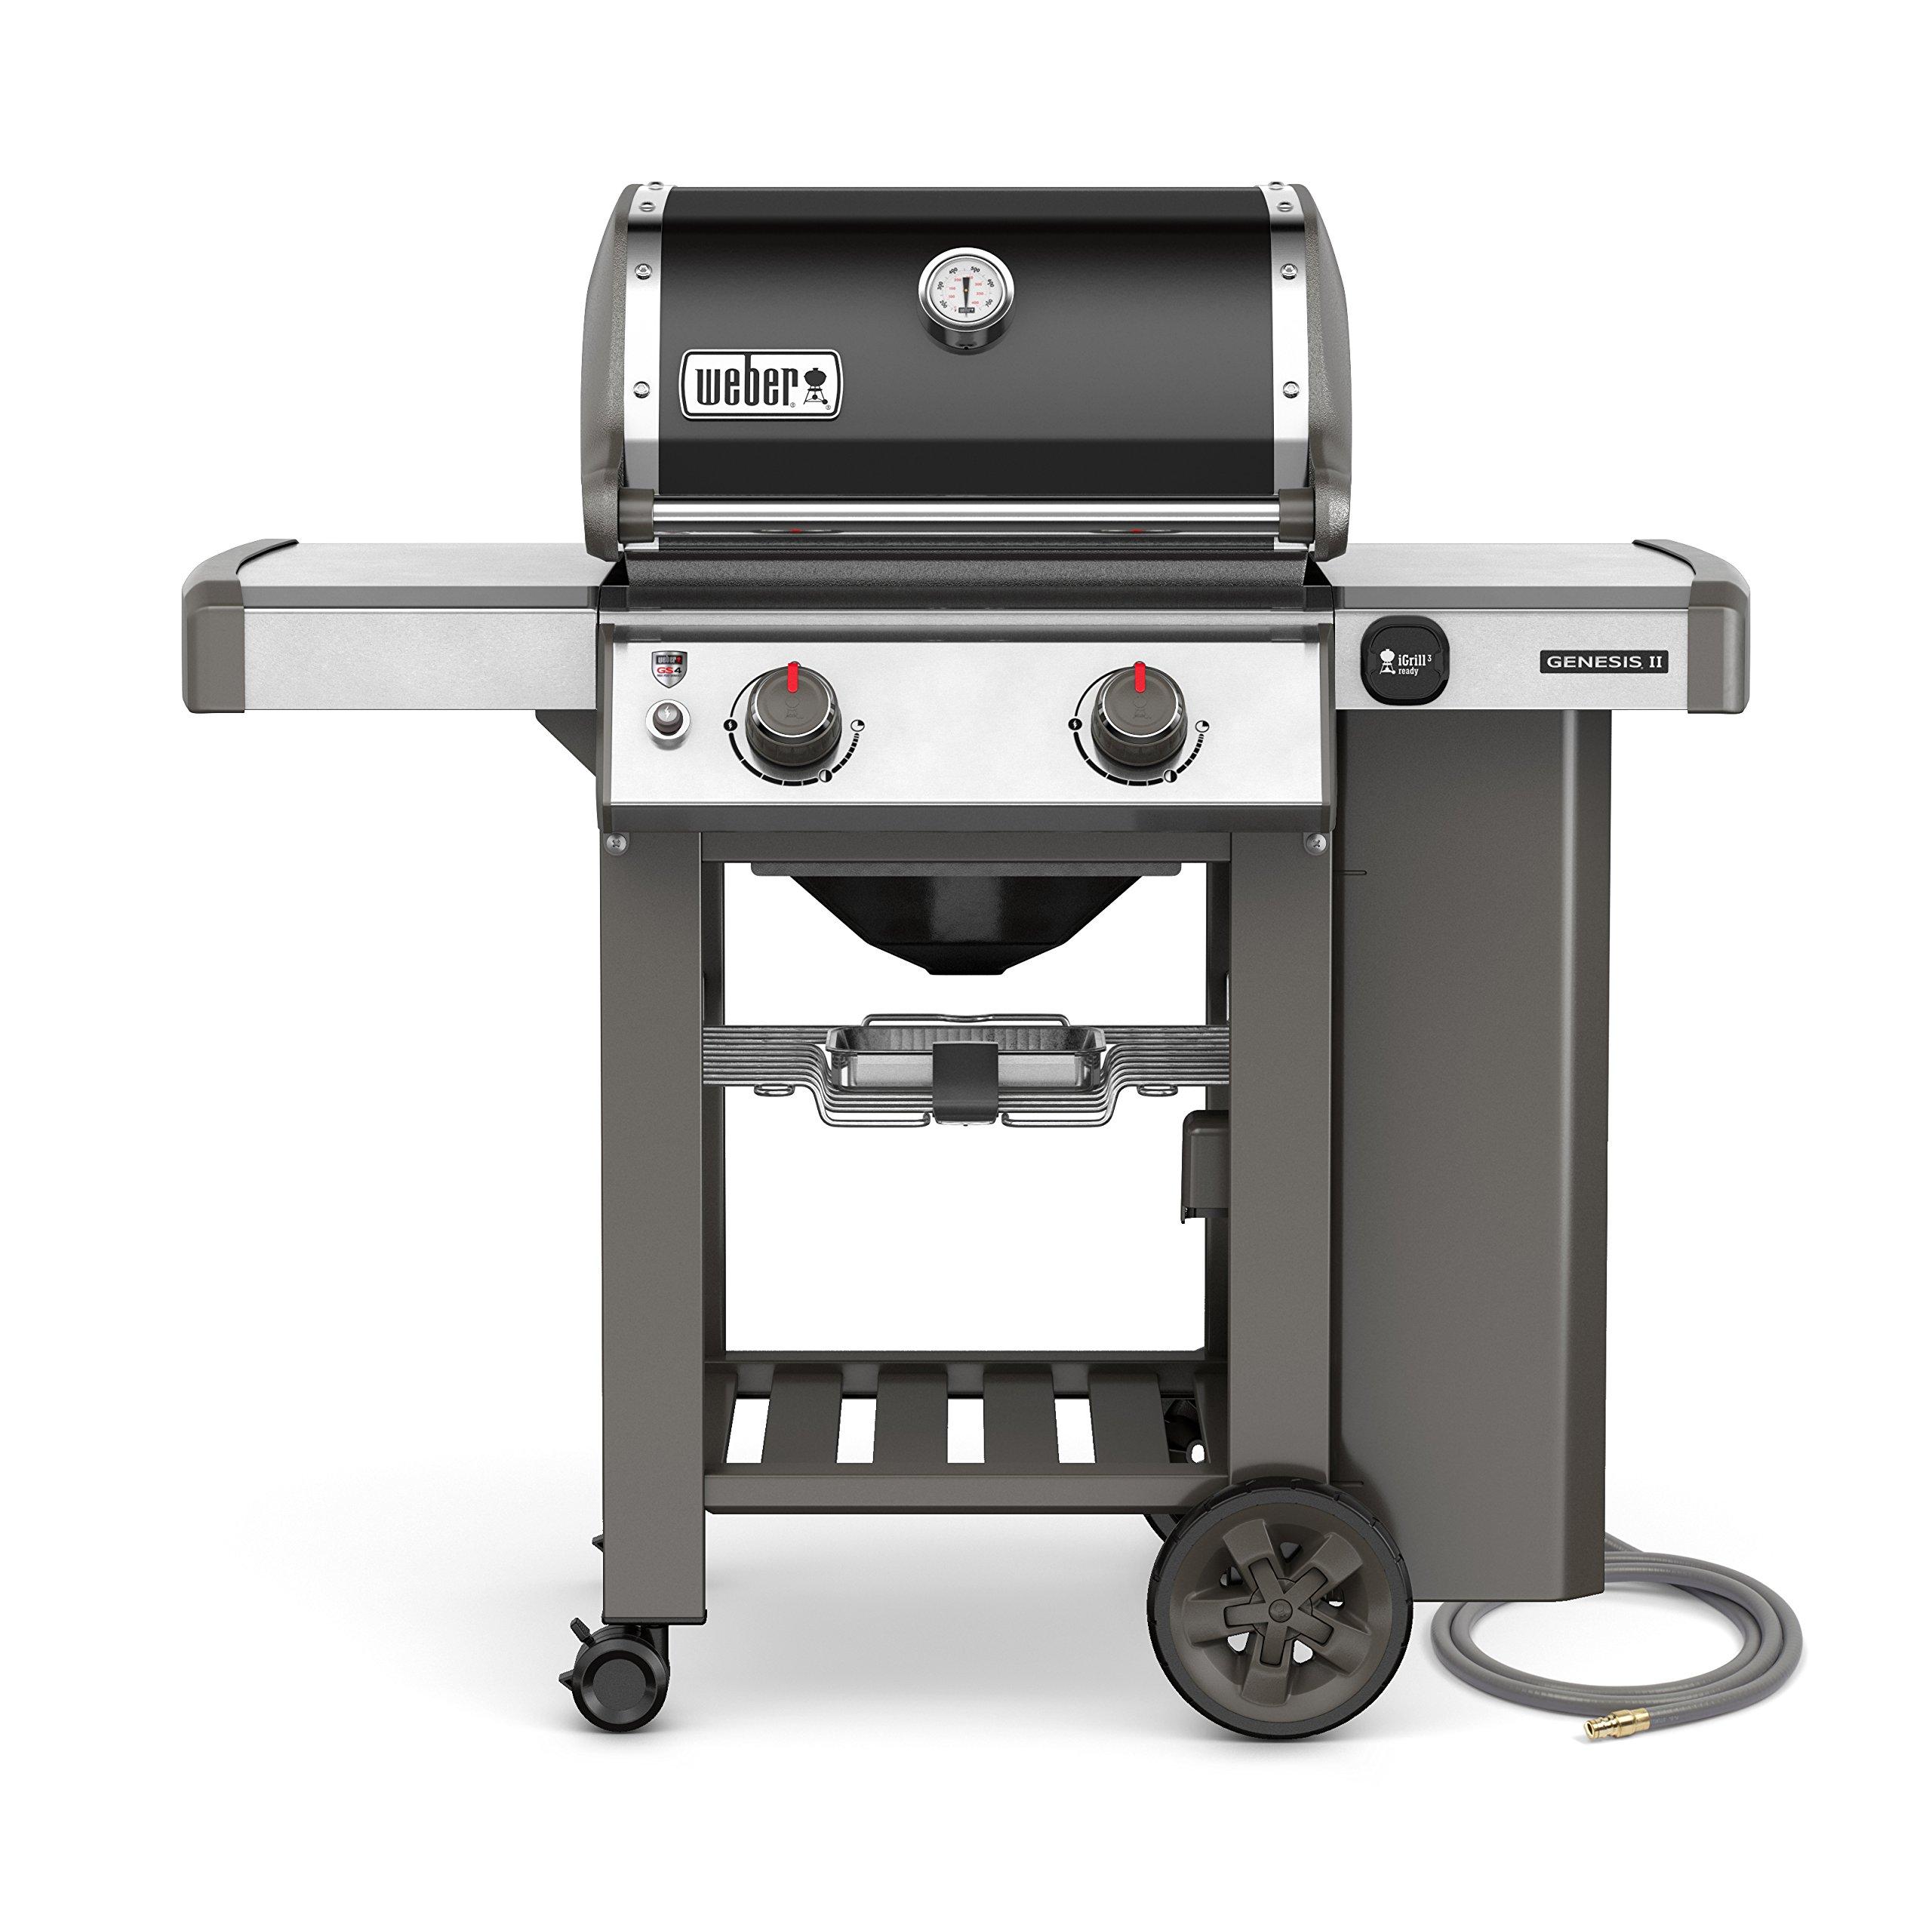 Weber 65010001 Genesis II E-210 Natural Gas Grill, Black, Two-Burner,